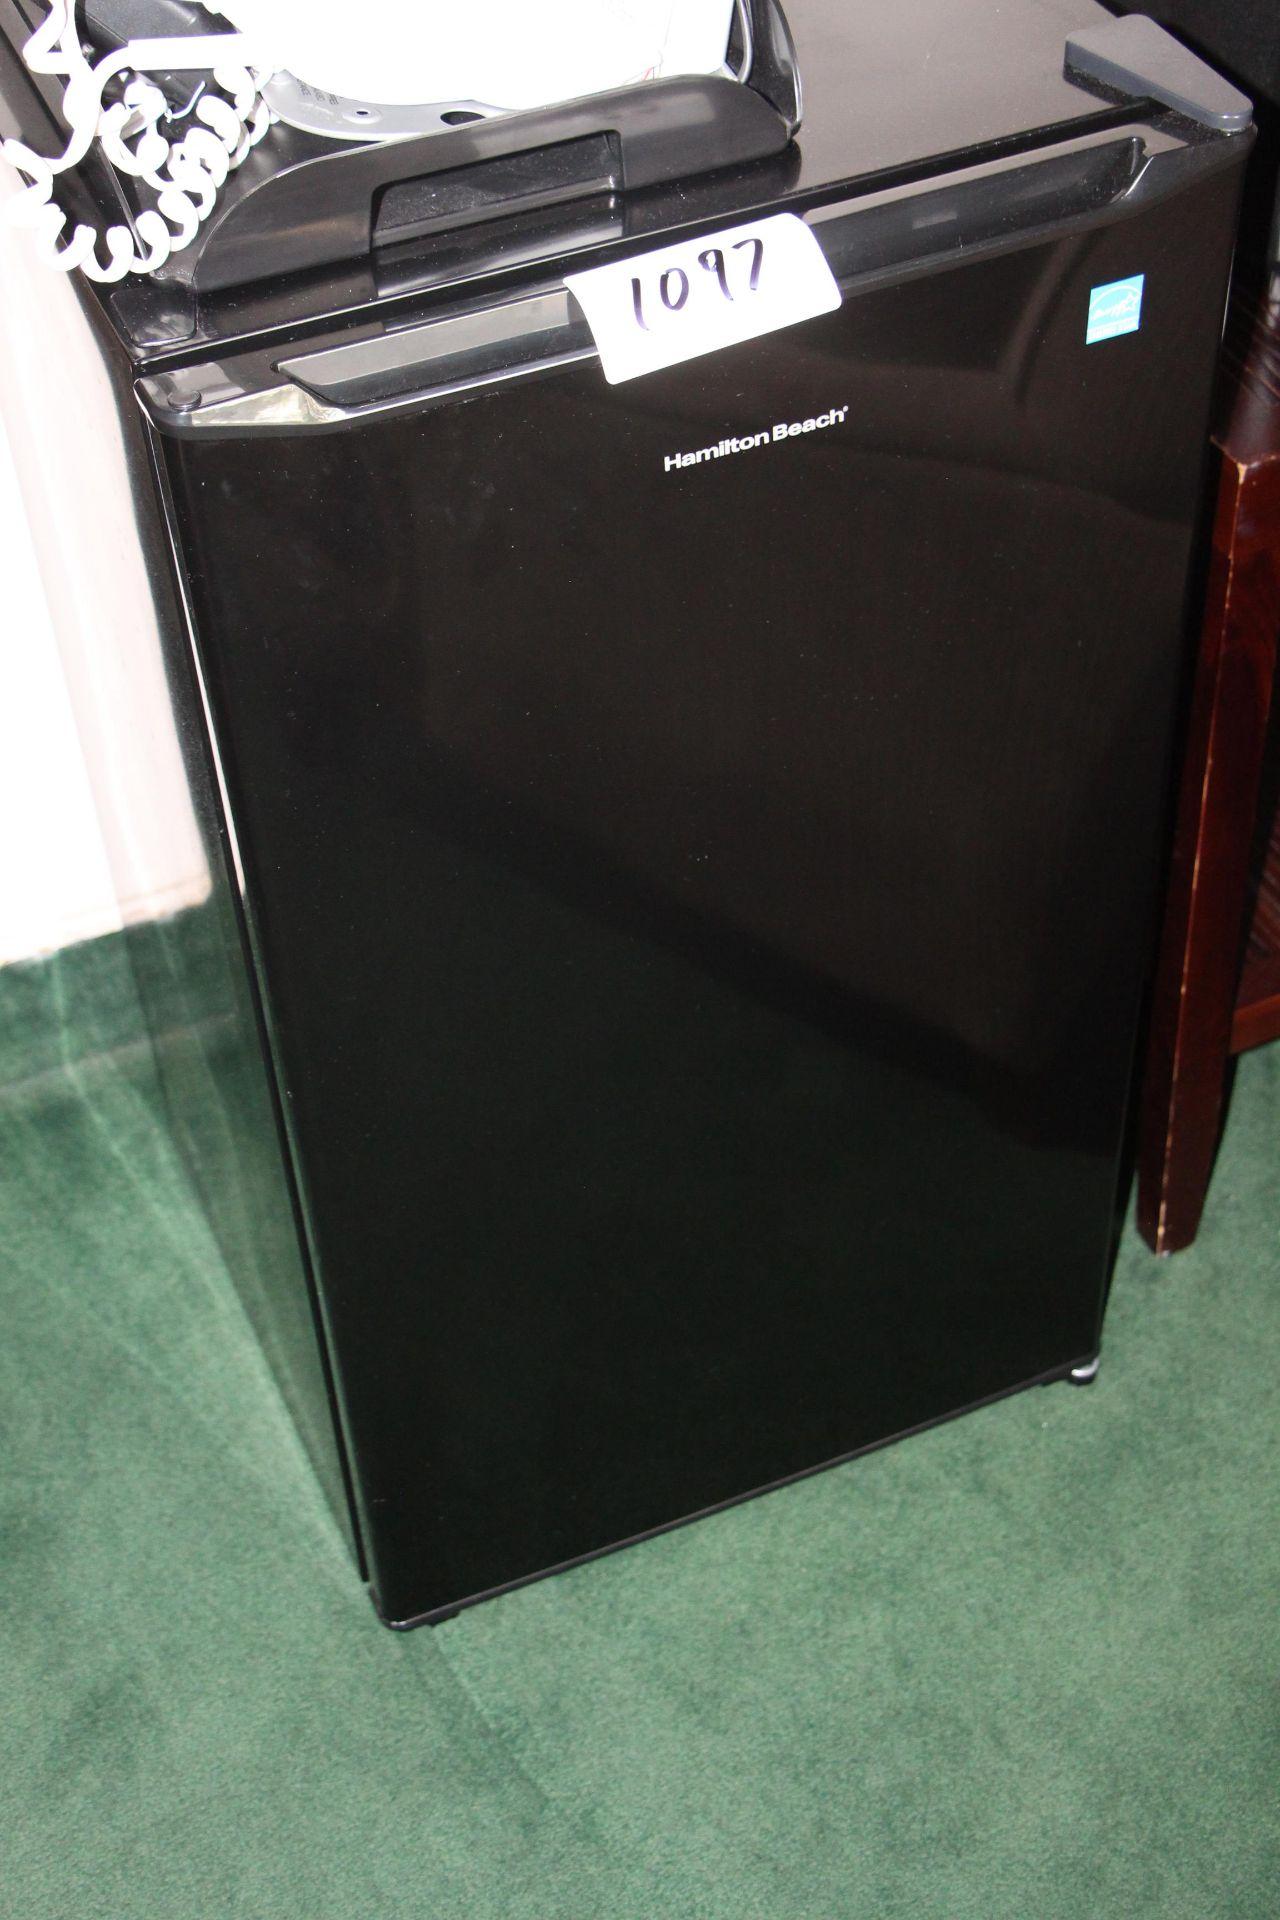 Lot 1097 - Hamilton Beach bar fridge